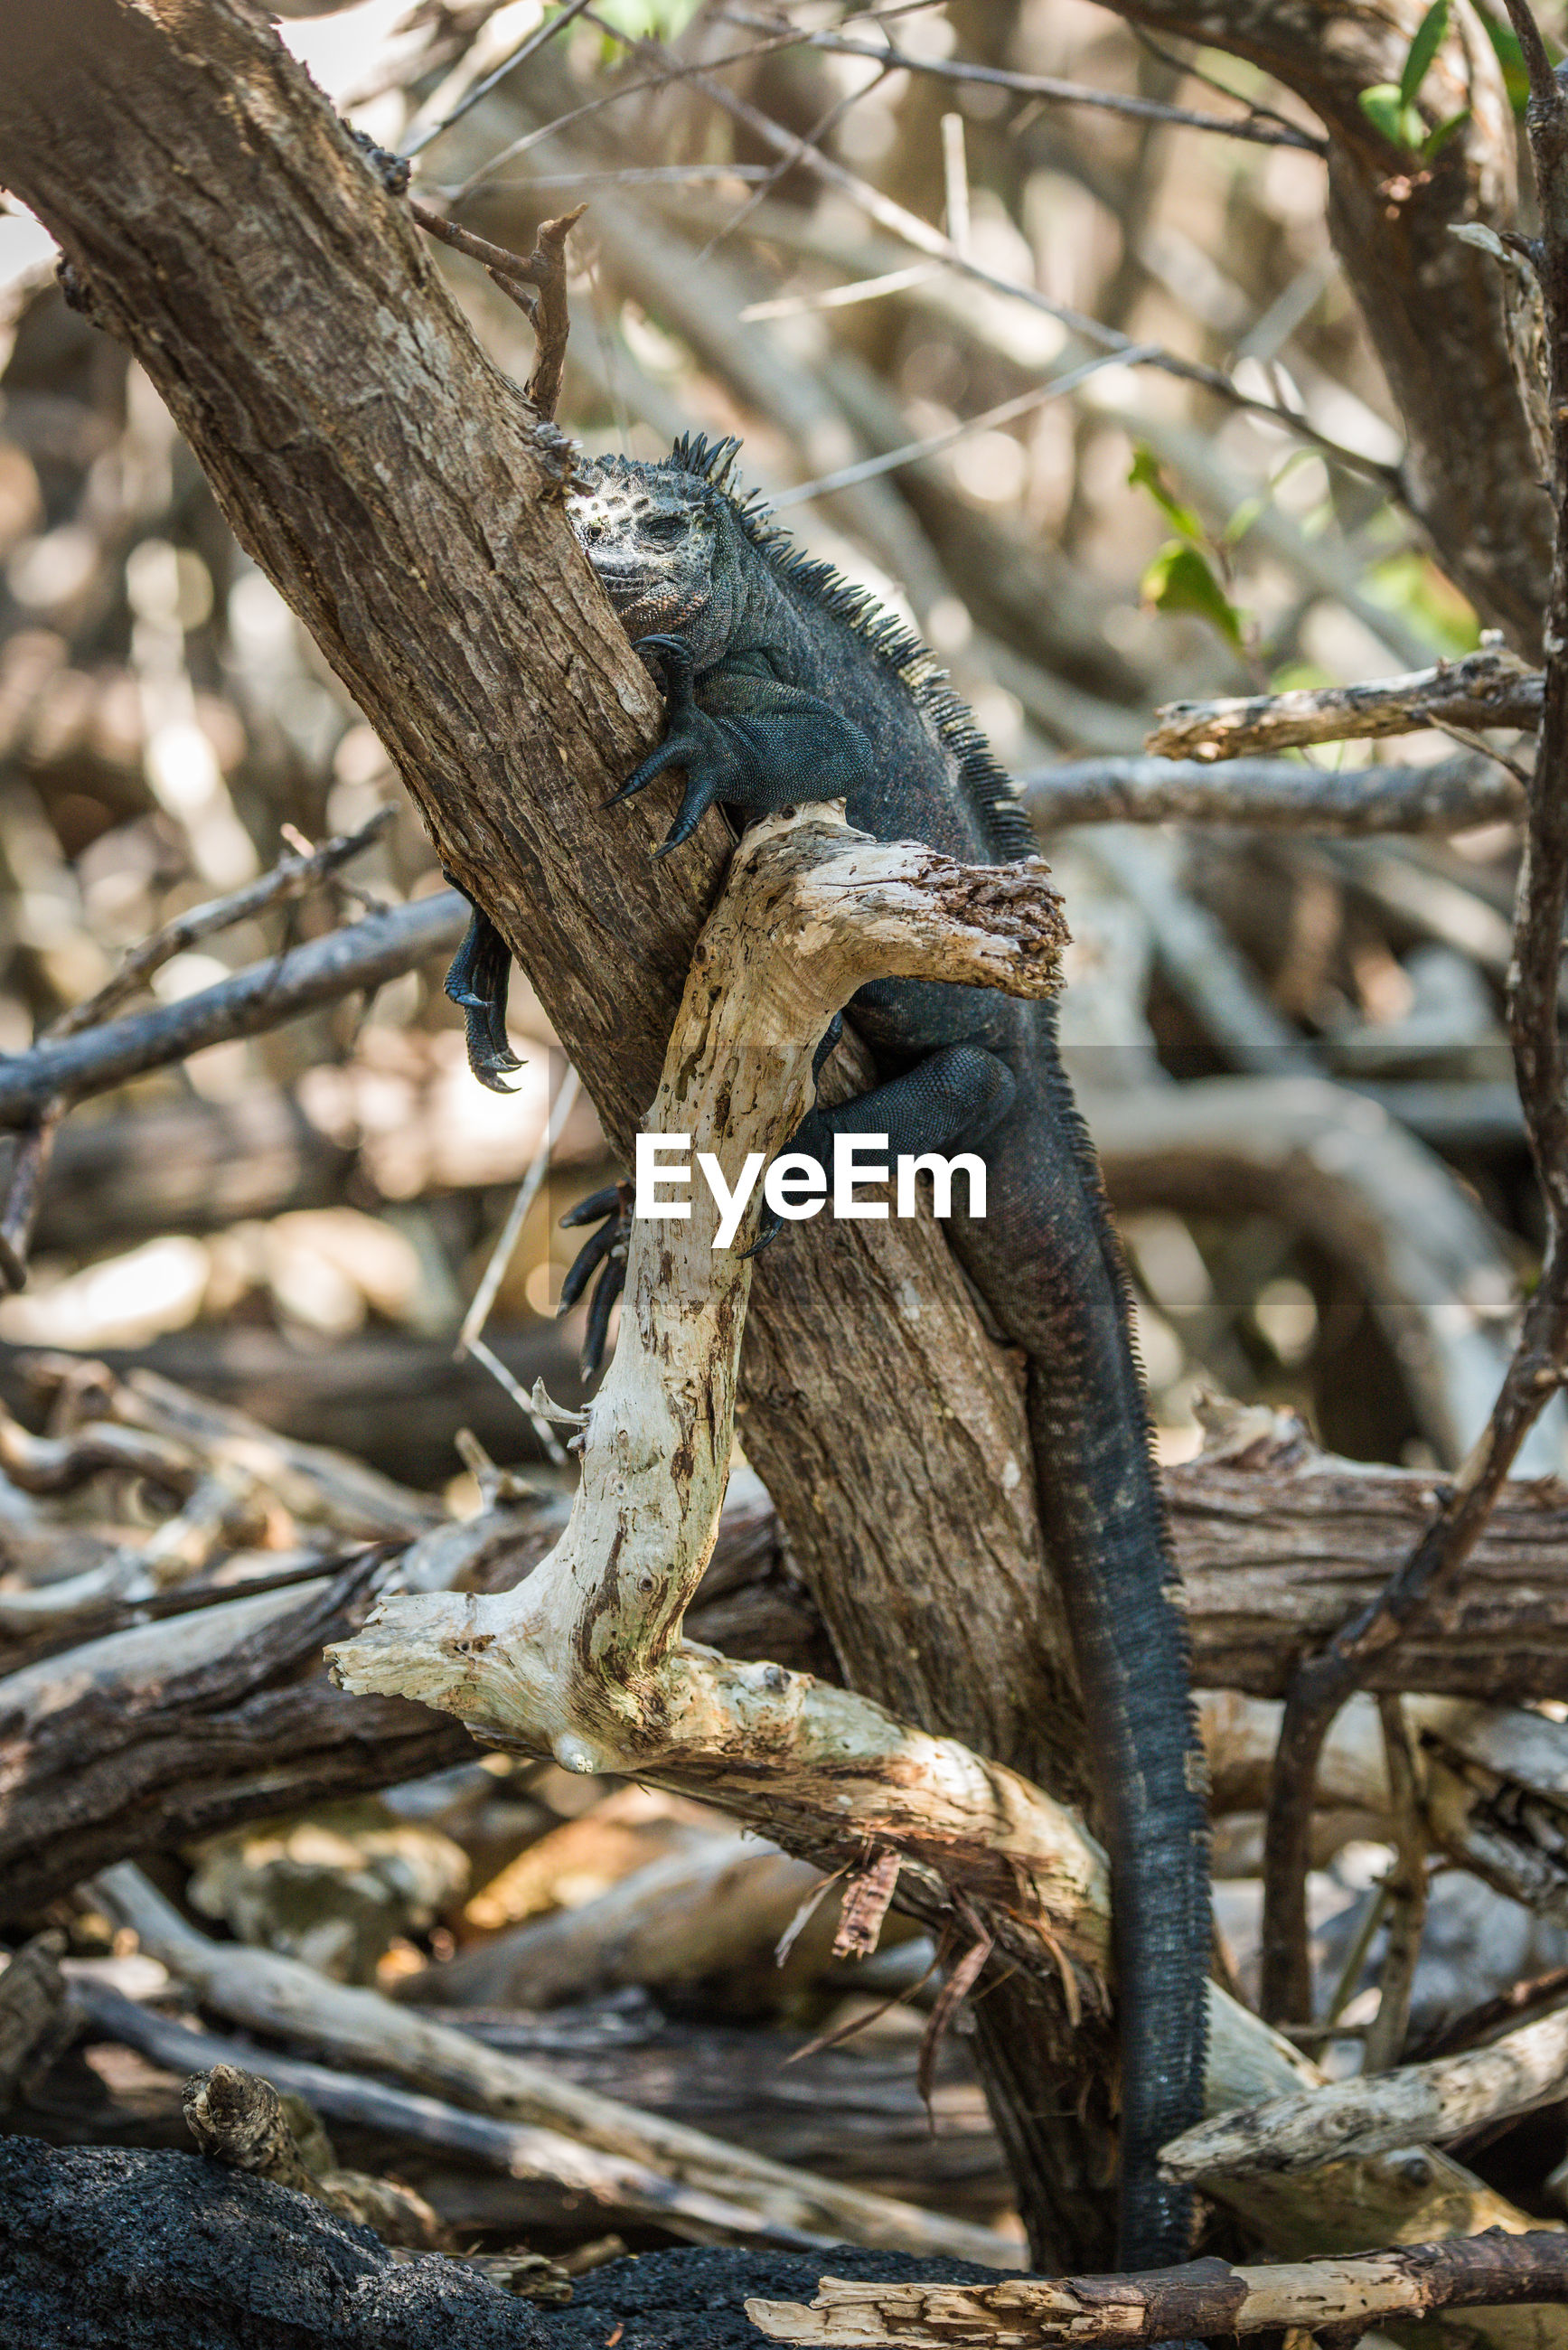 Marine iguana on dried plant